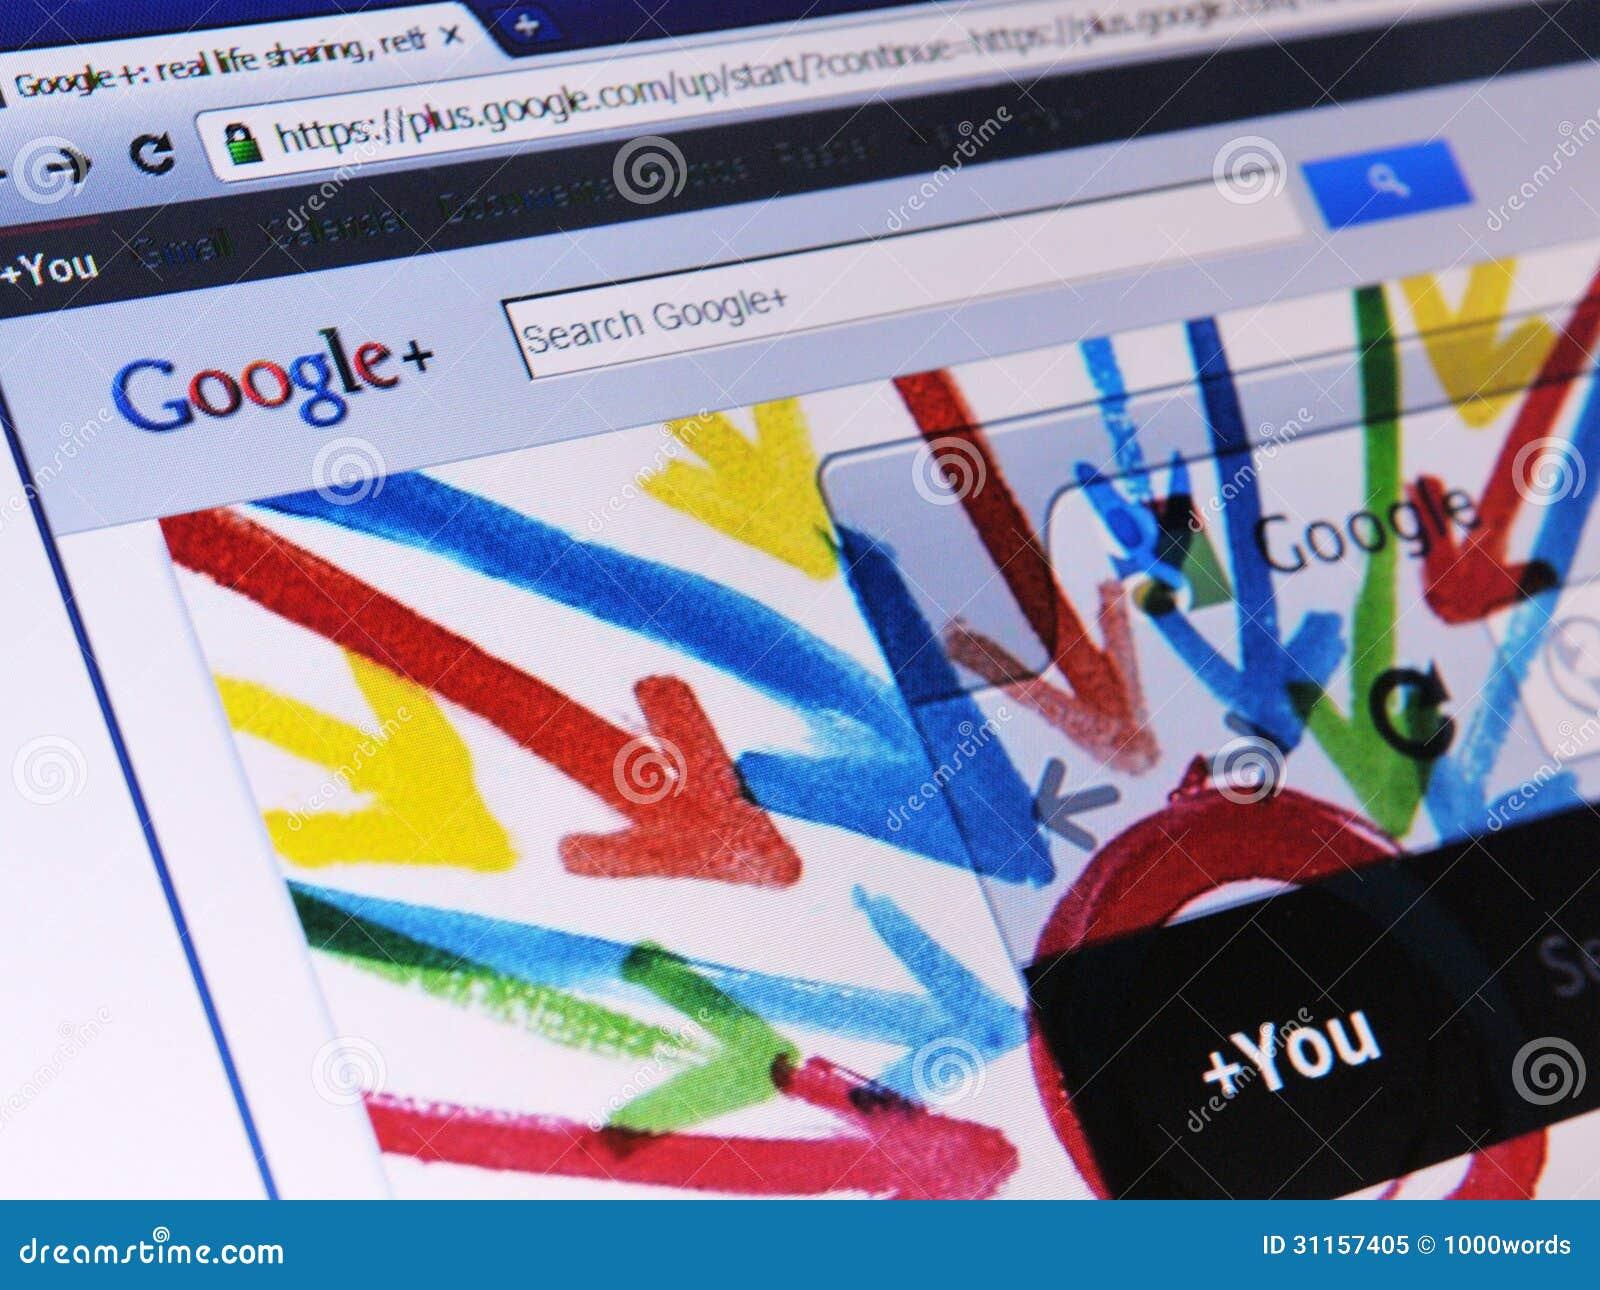 Google+ Webpage